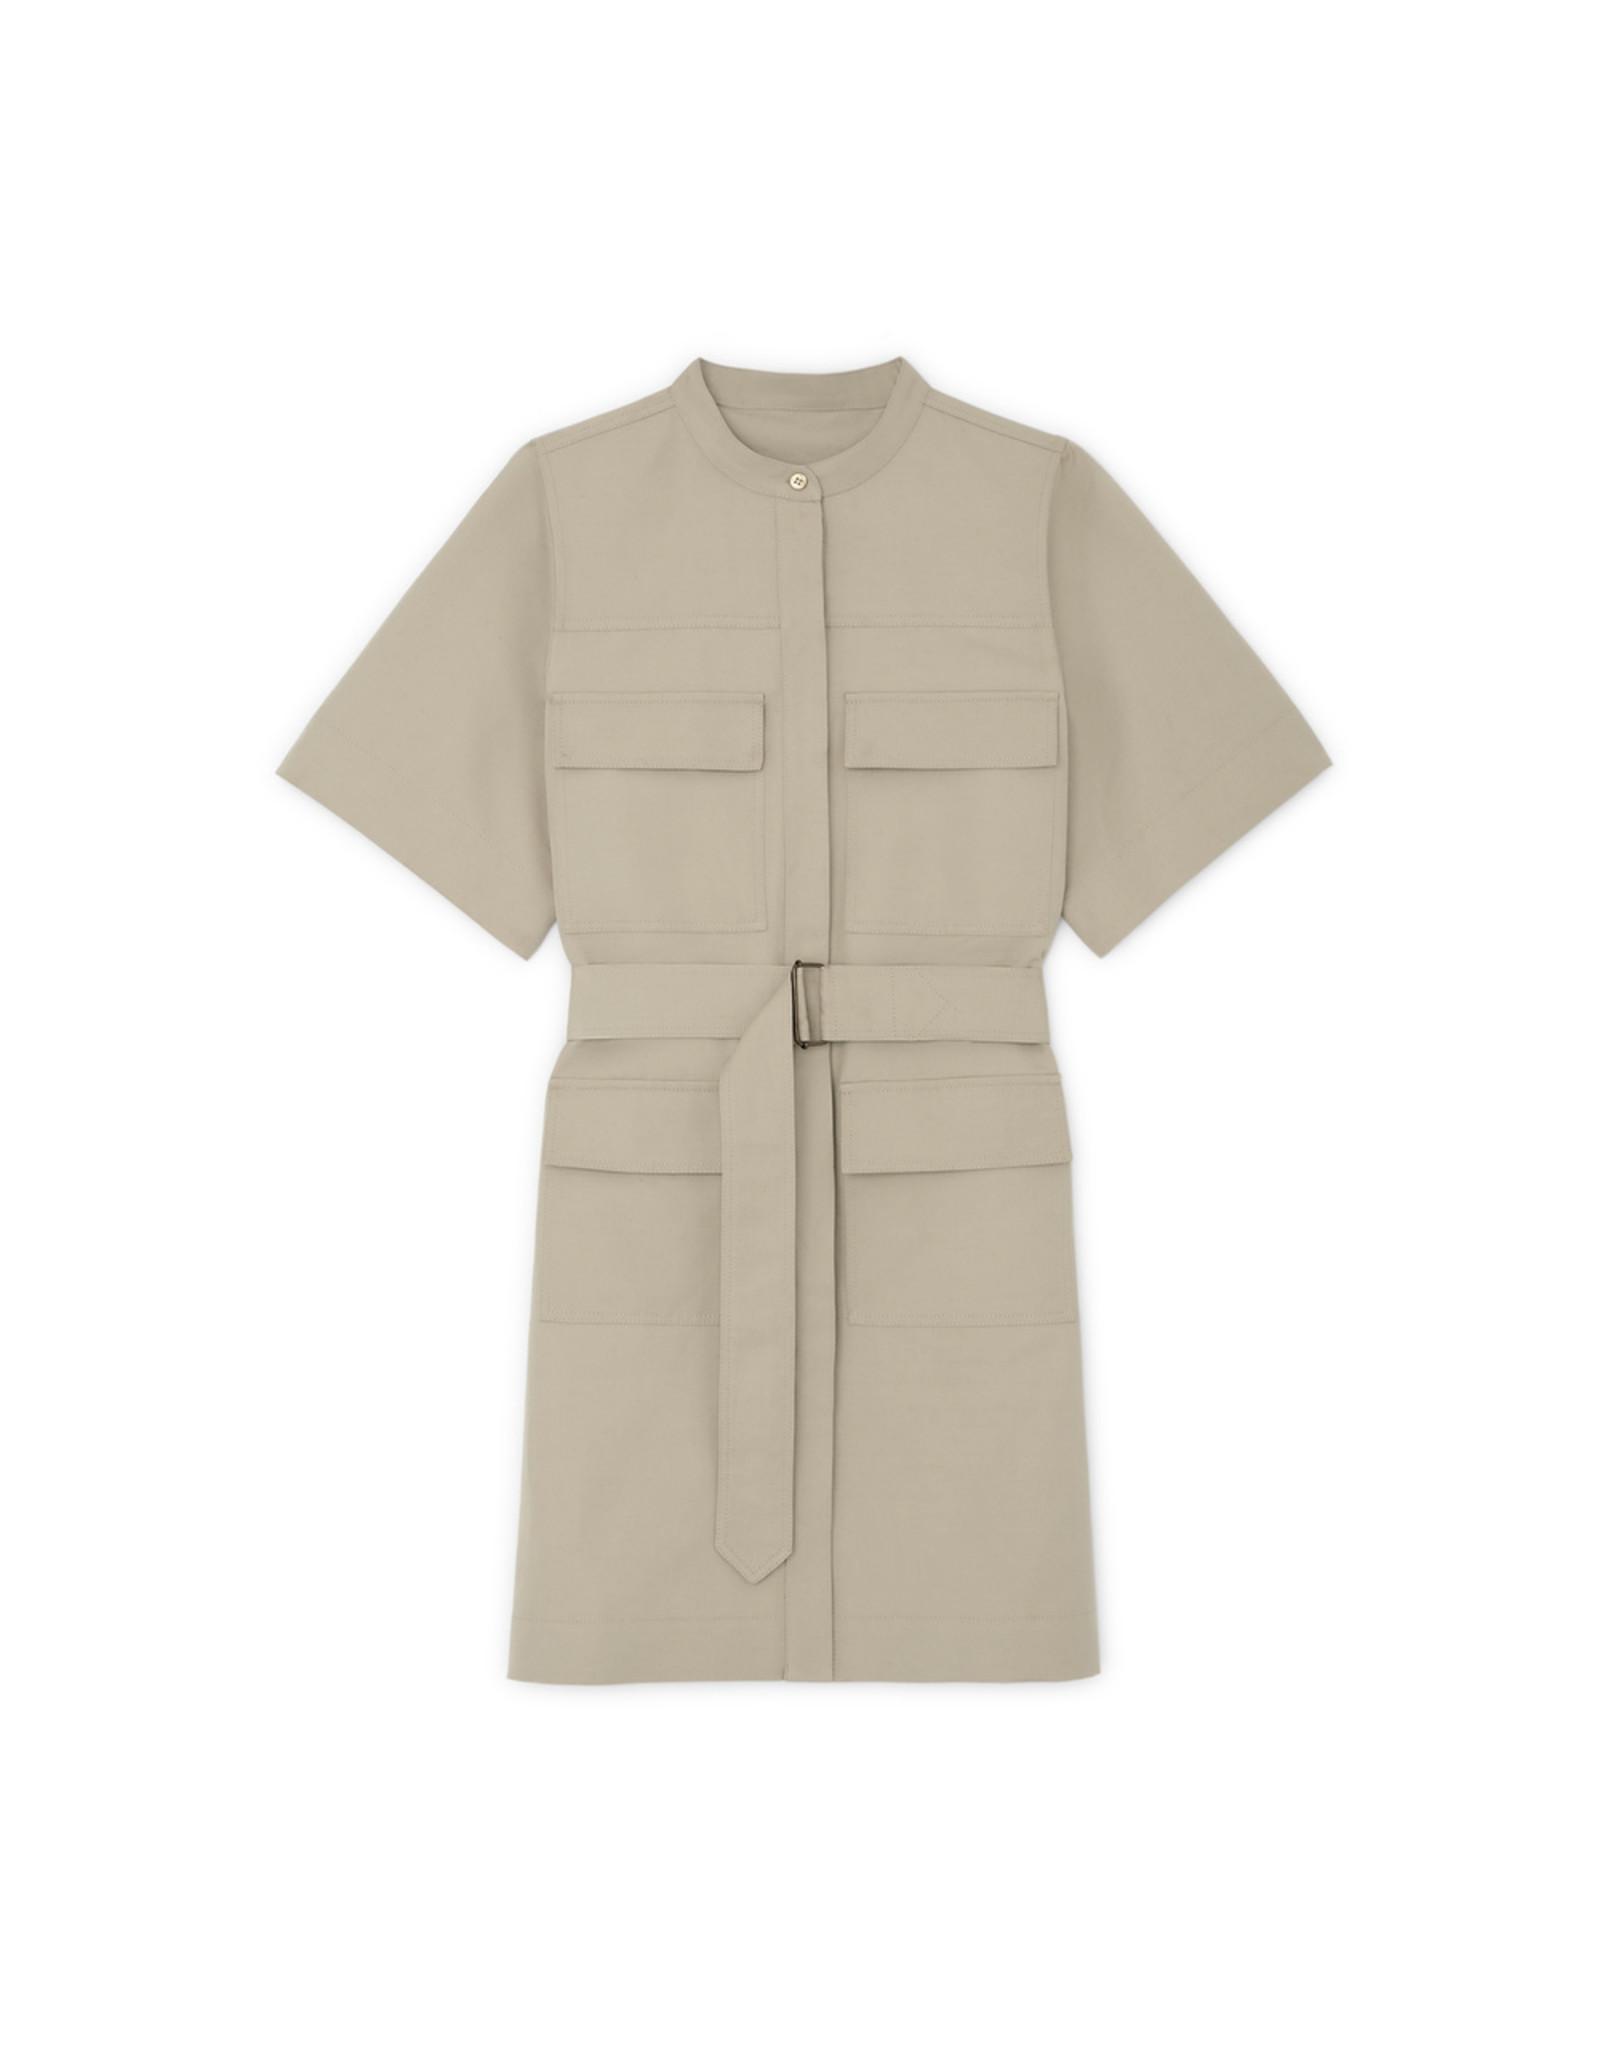 G. Label Umbria Utility Shirtdress (Color: Khaki, Size: L)